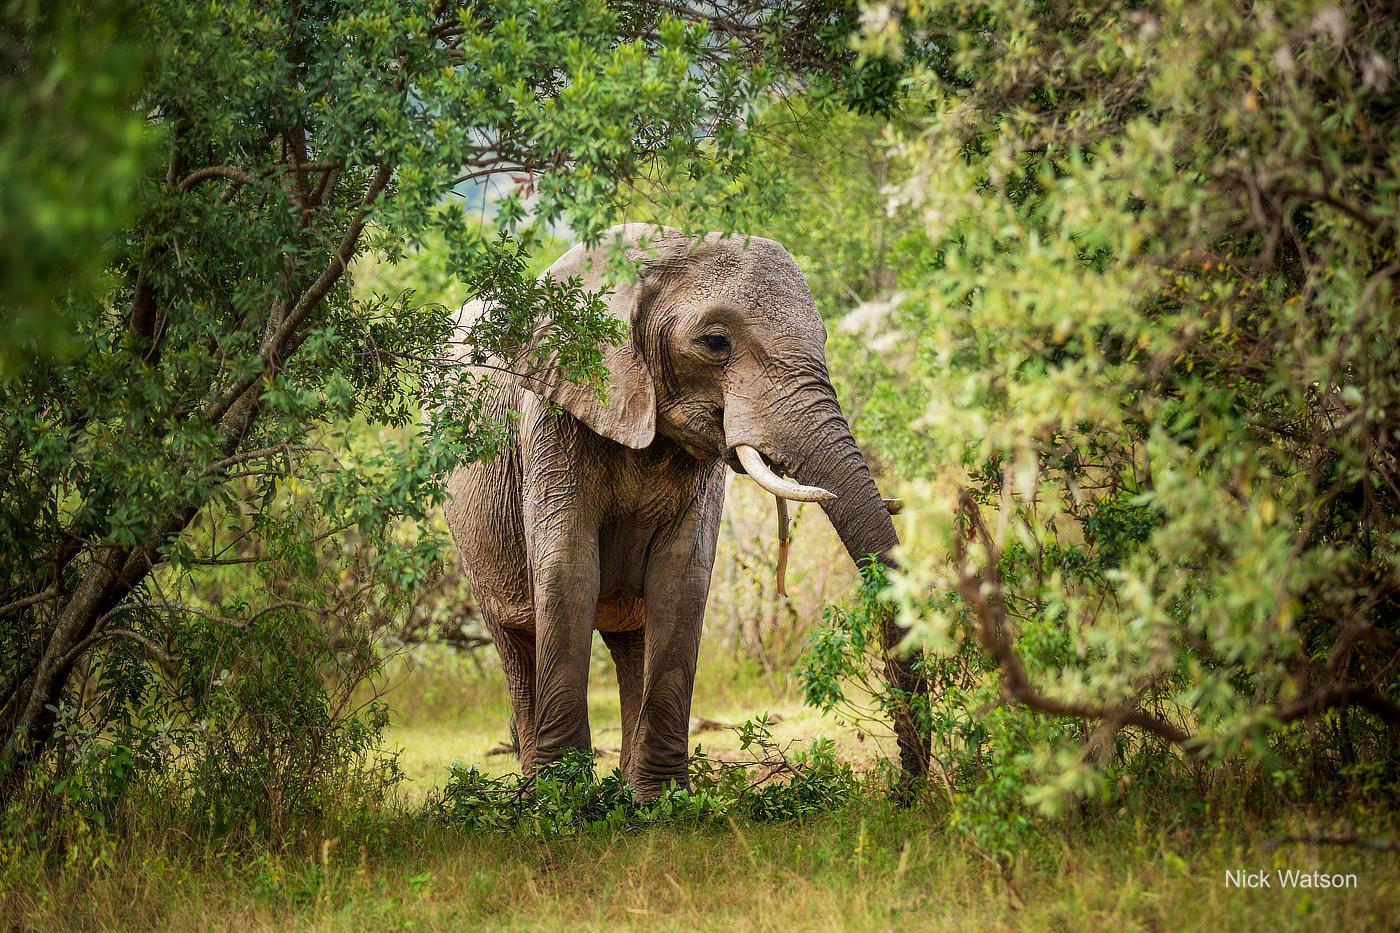 Elephant Maasai Mara African Photography Safari Nick Watson